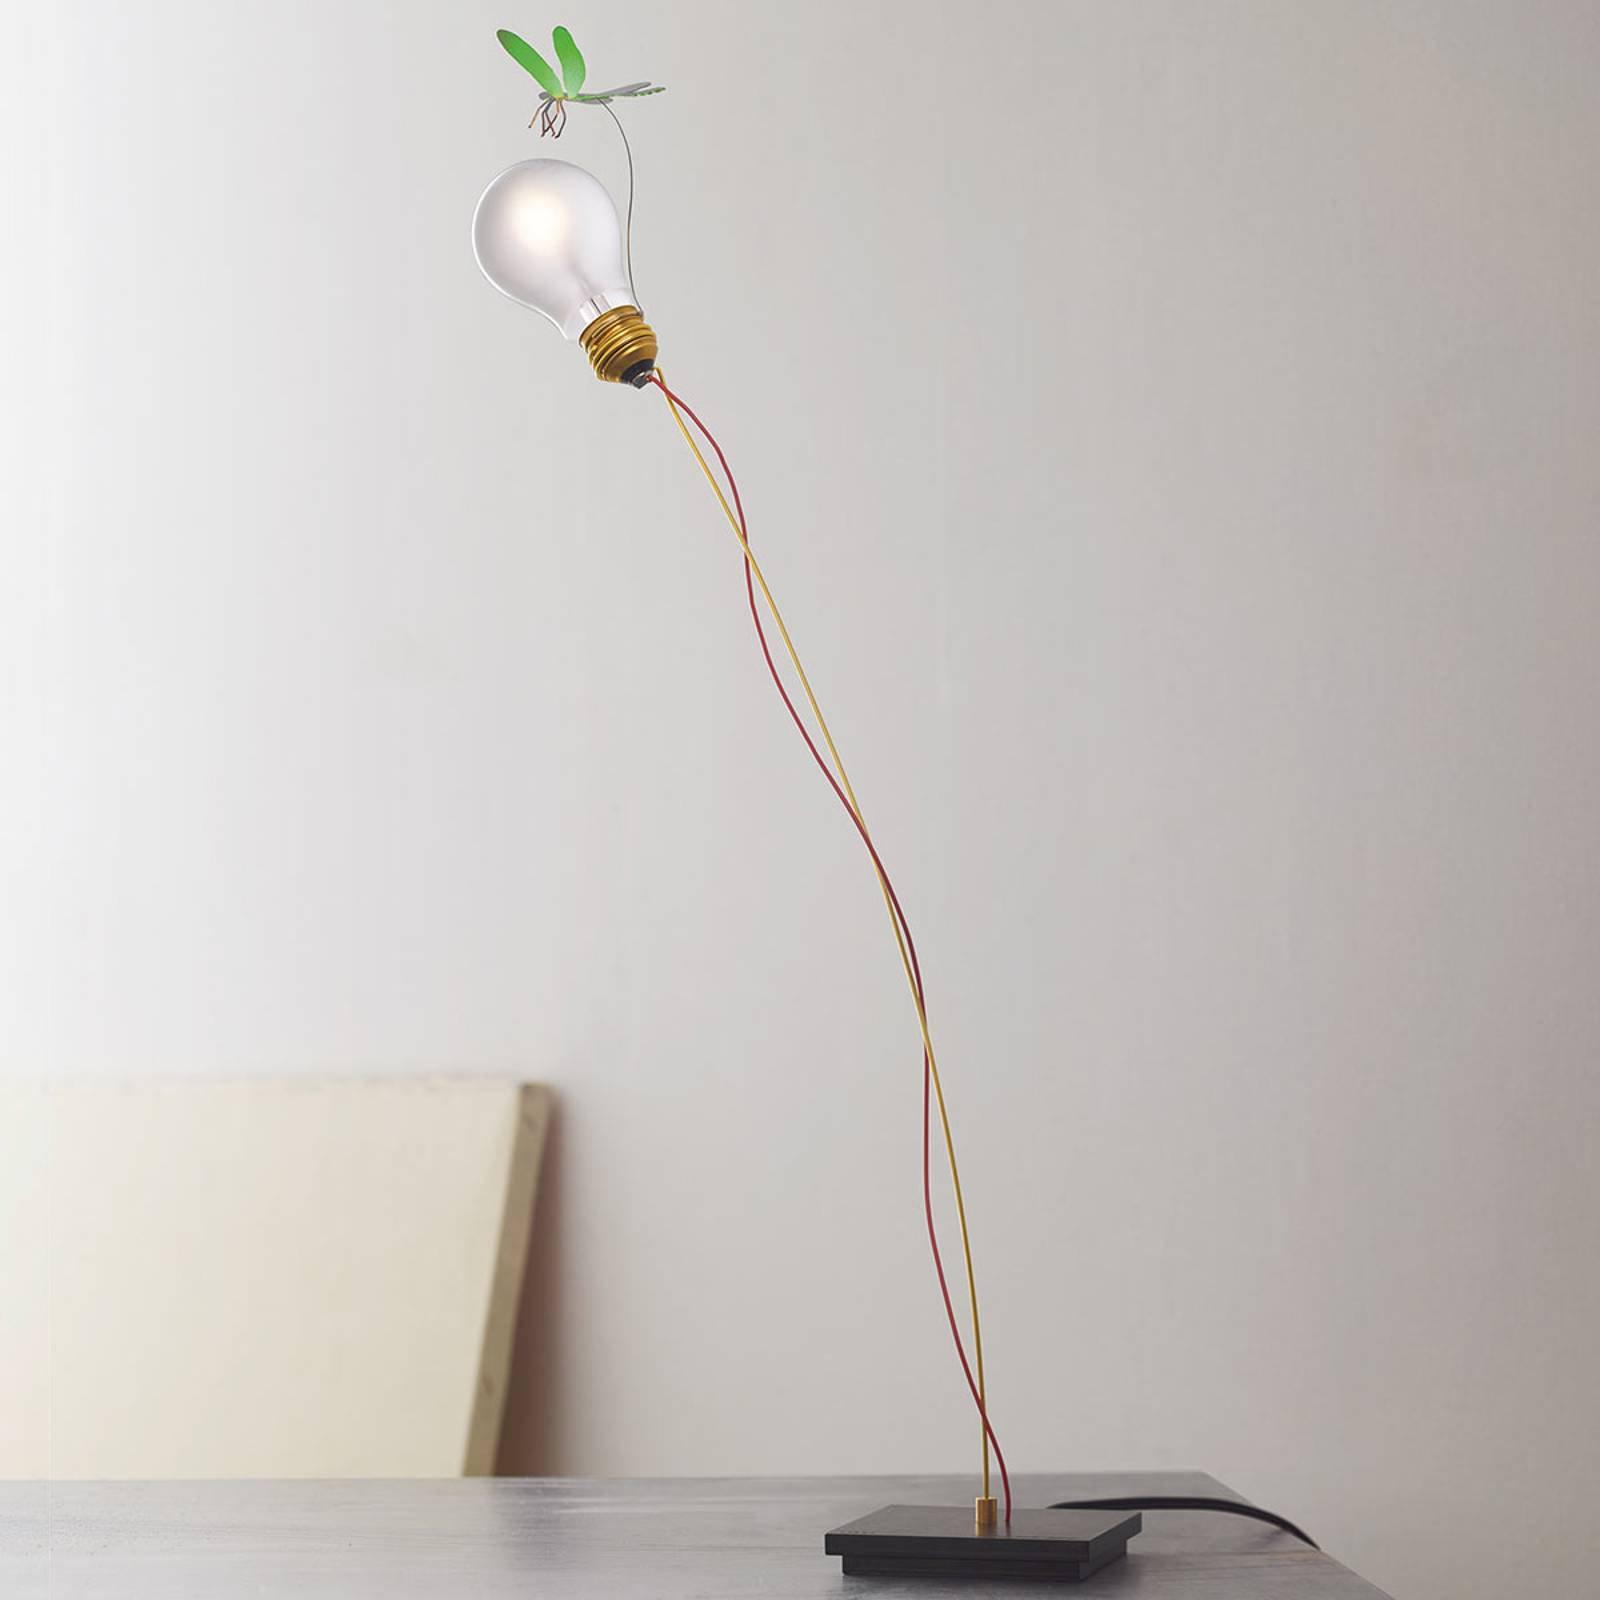 Bordlampe I Ricchi Poveri Bzzzz - grønn libelle